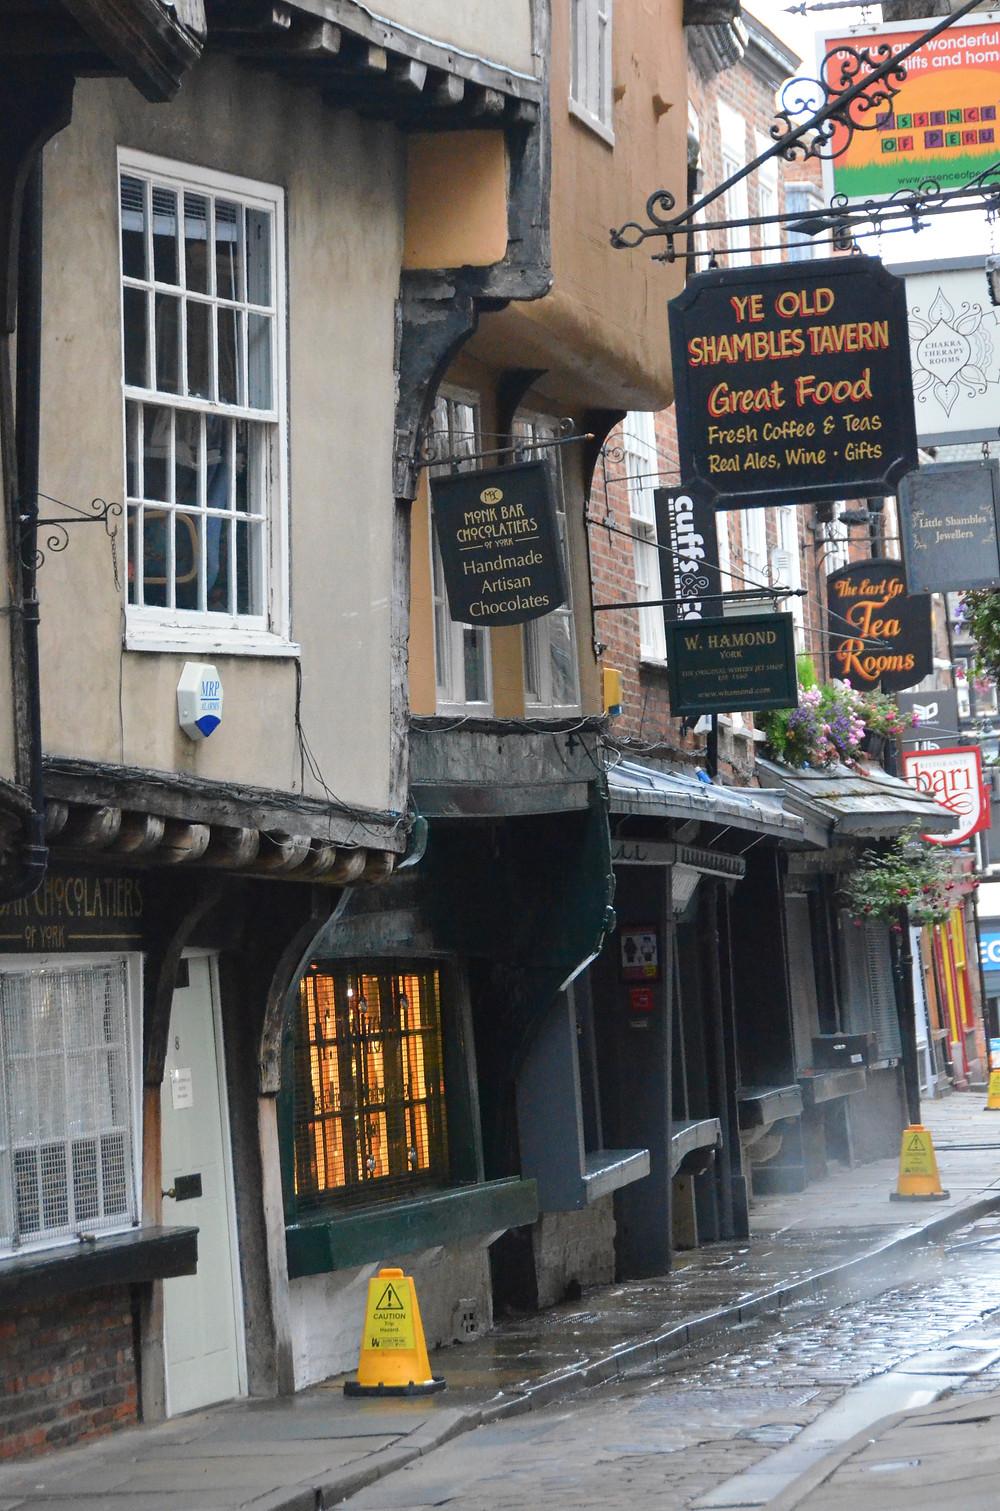 The Shambles of York